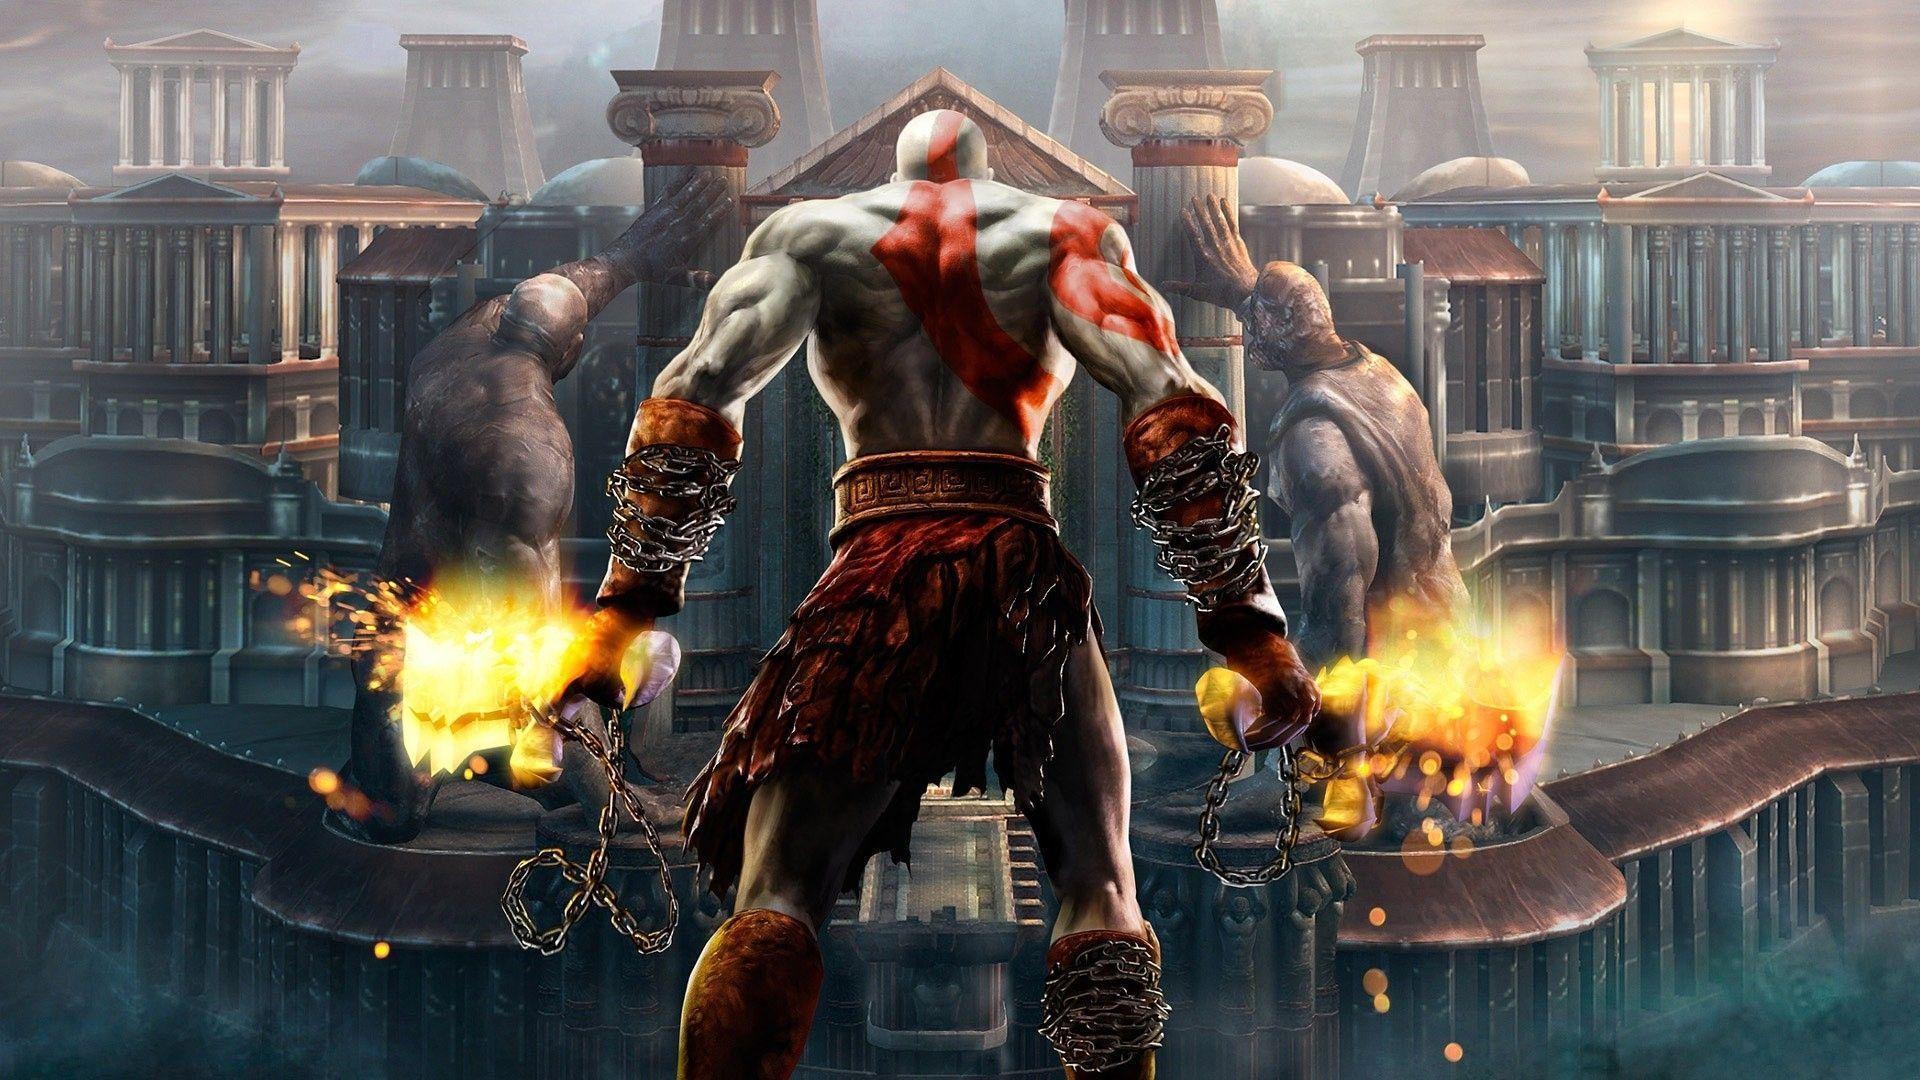 god of war wallpapers